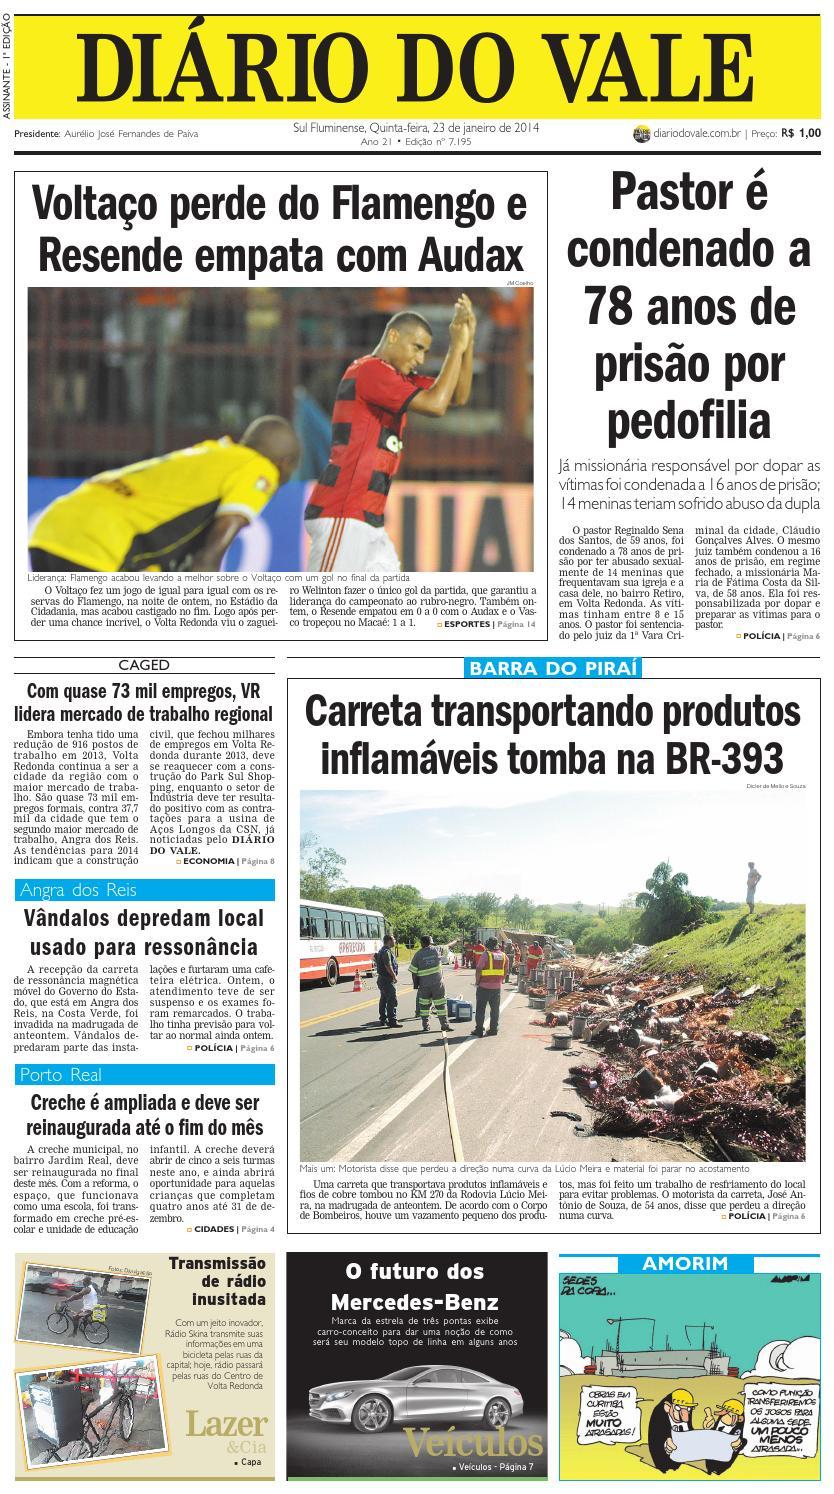 7195 diario quinta feira 23 01 2014 by Diário do Vale - issuu bd627b4831b79